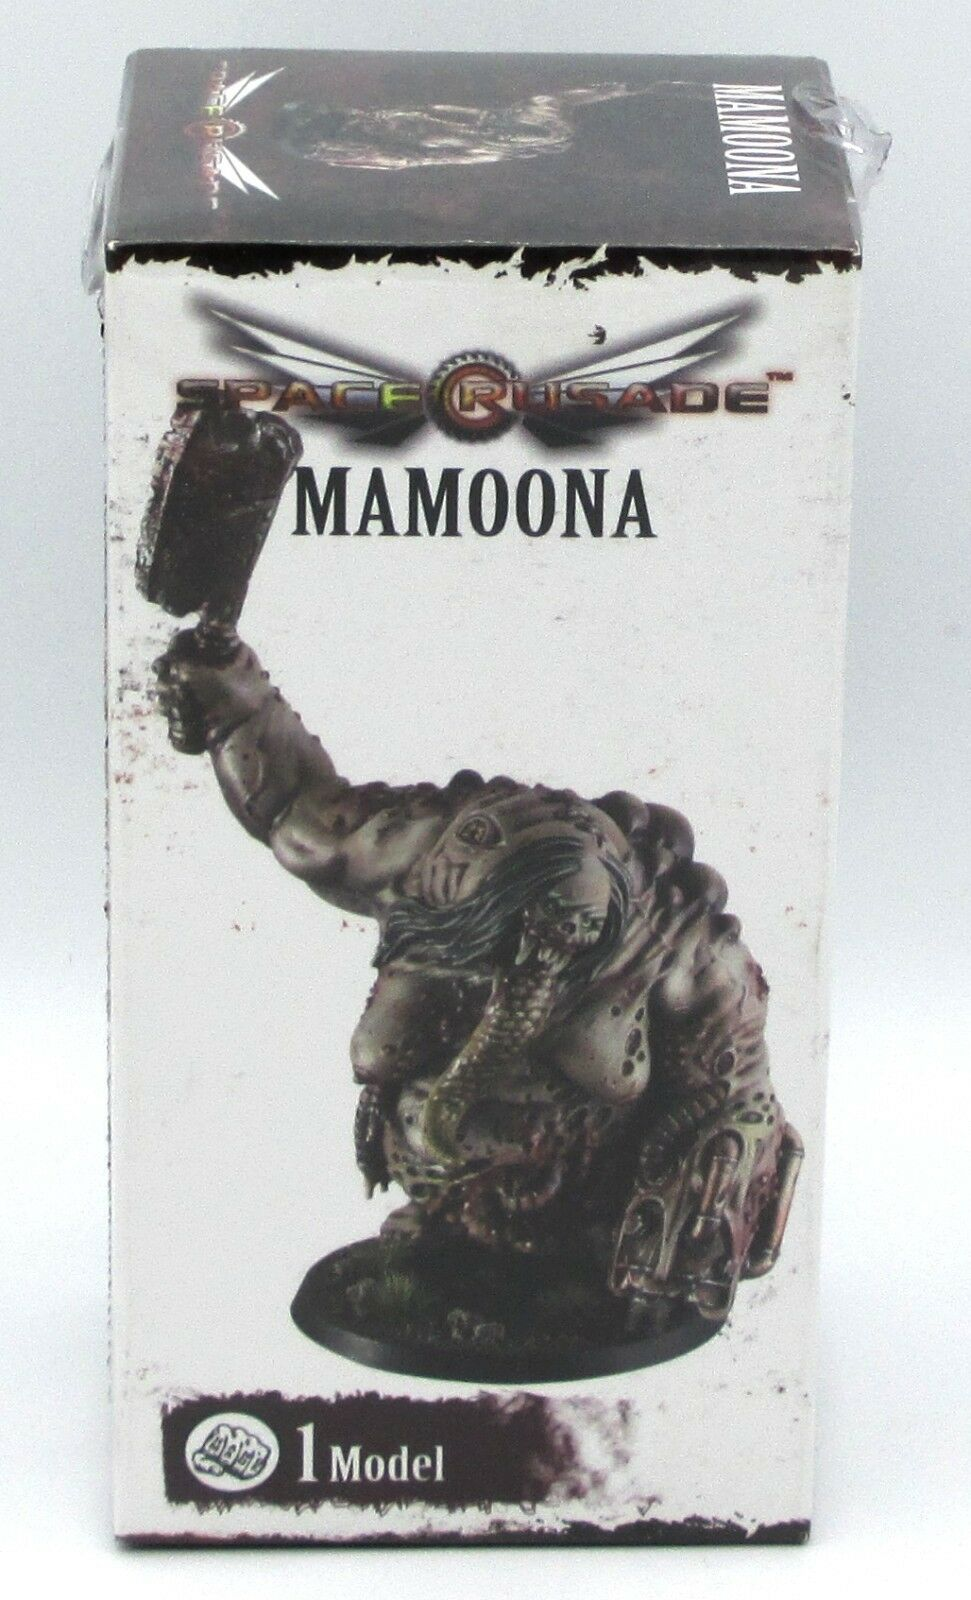 Space Crusade PIC301205 Mamoona Female Plague Demon Chaos Disease Lord Hero NIB